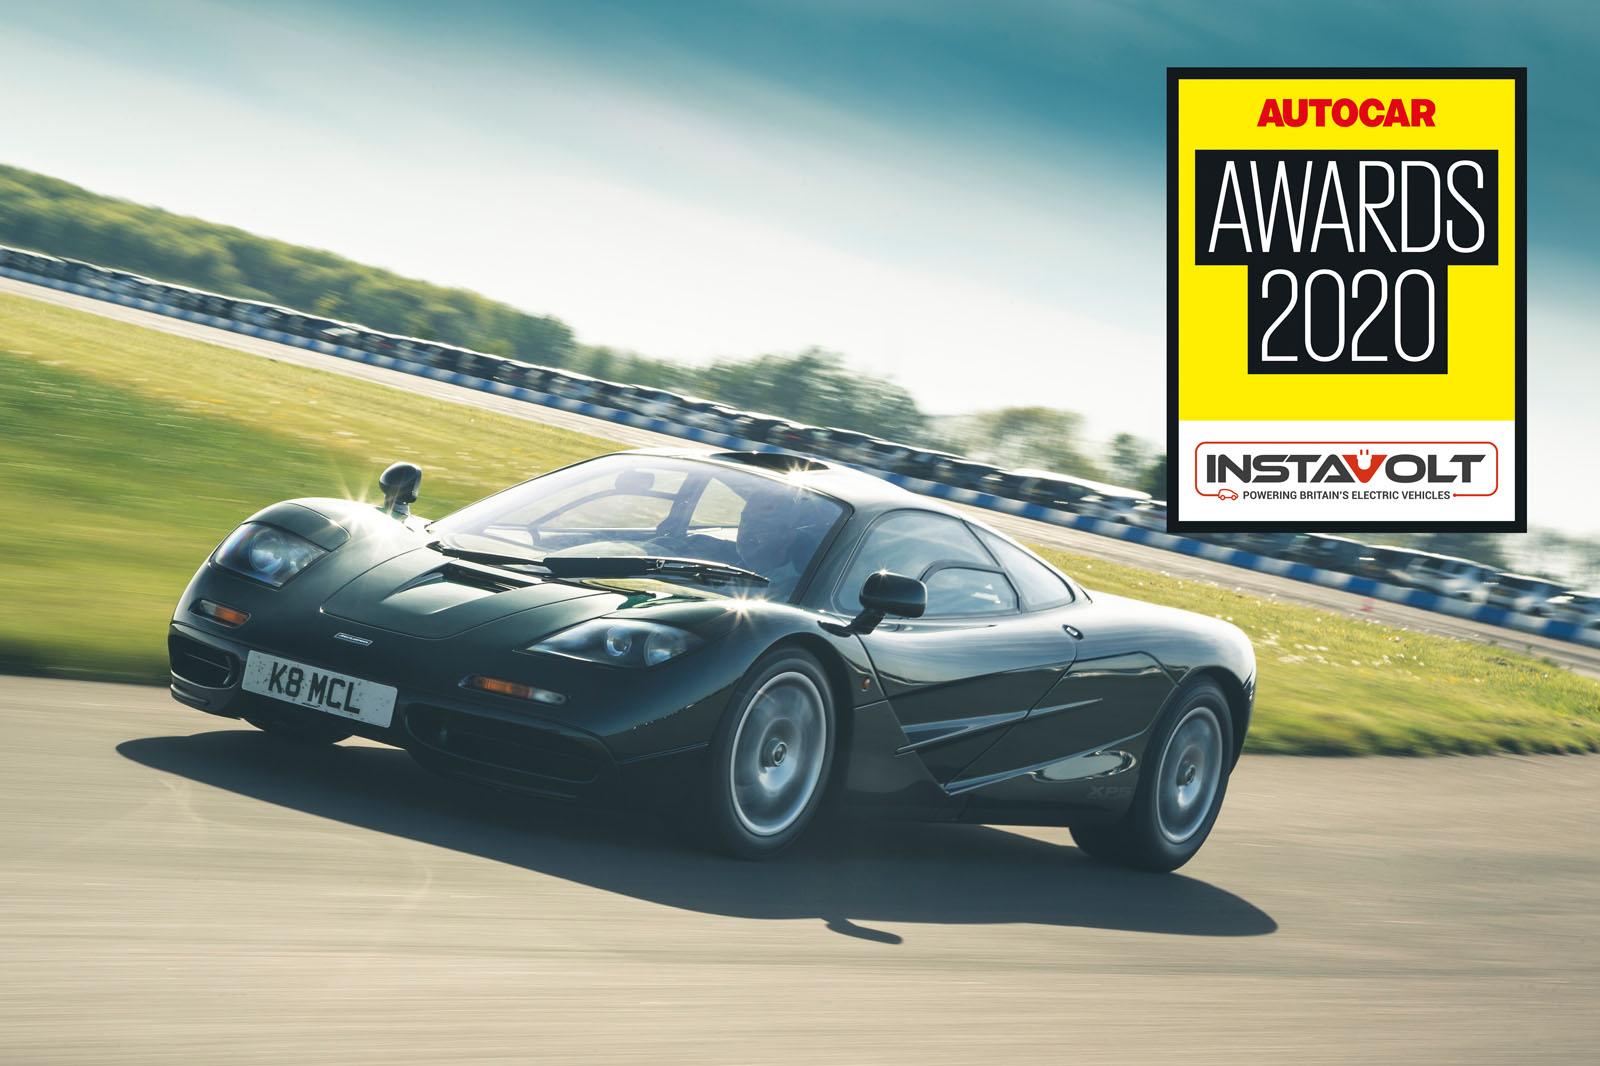 Autocar Awards 2020 Mclaren F1 Named Readers Champion Autocar